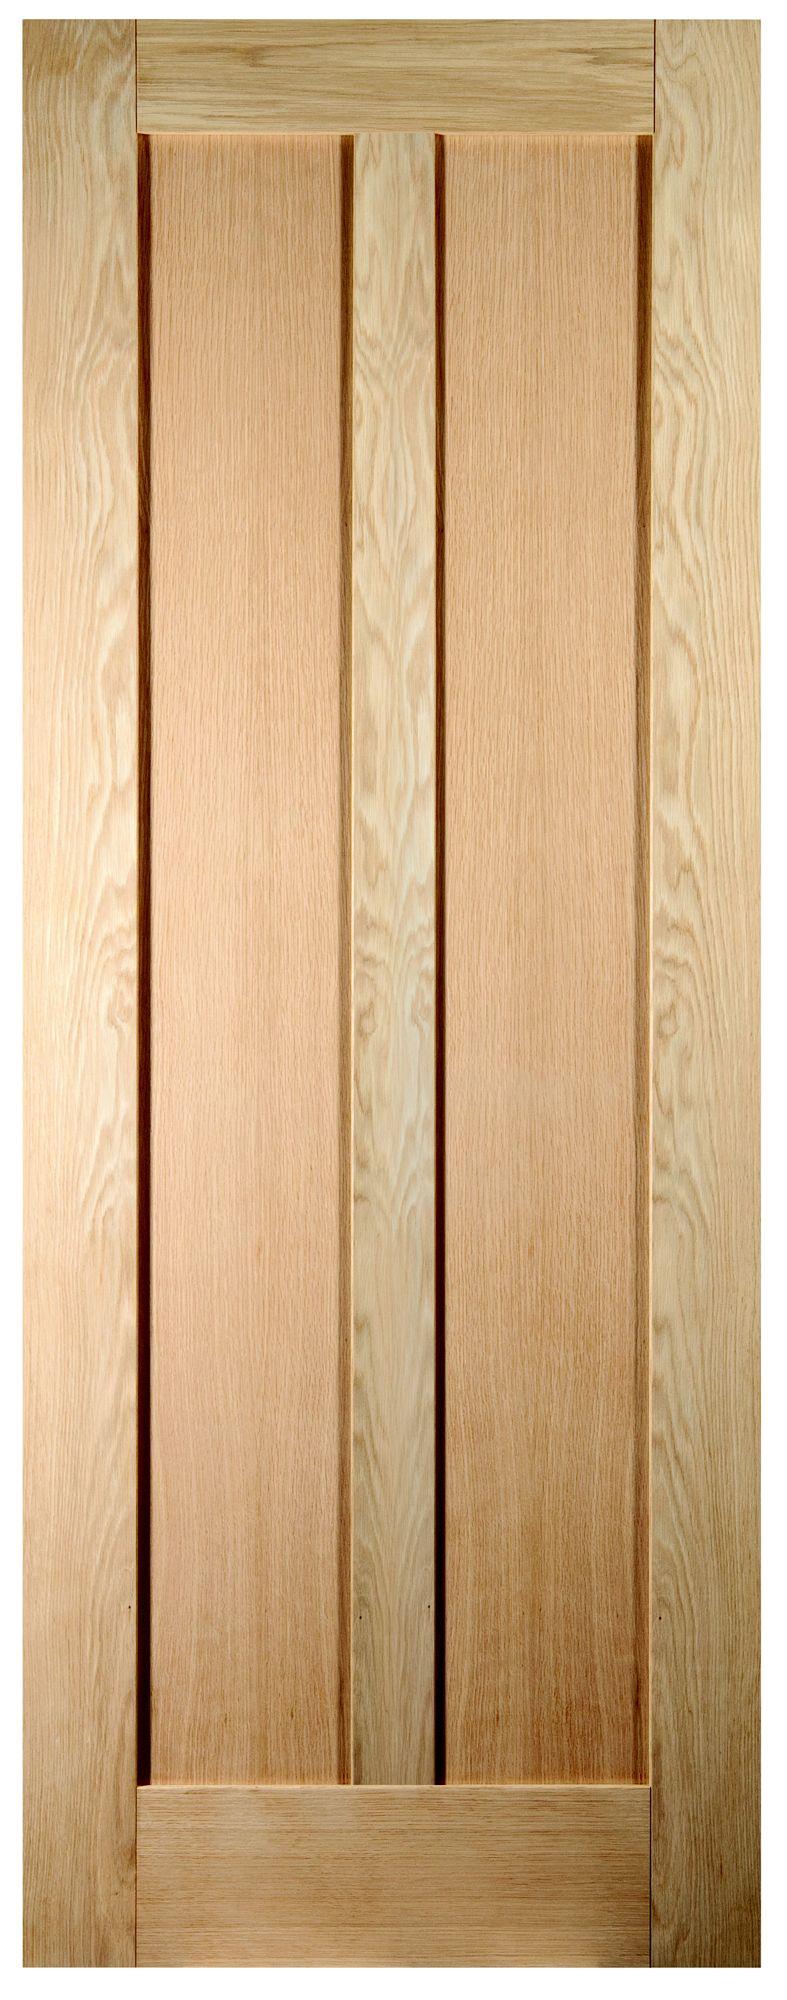 Vertical 2 Panel Oak Veneer Unglazed Internal Standard ...